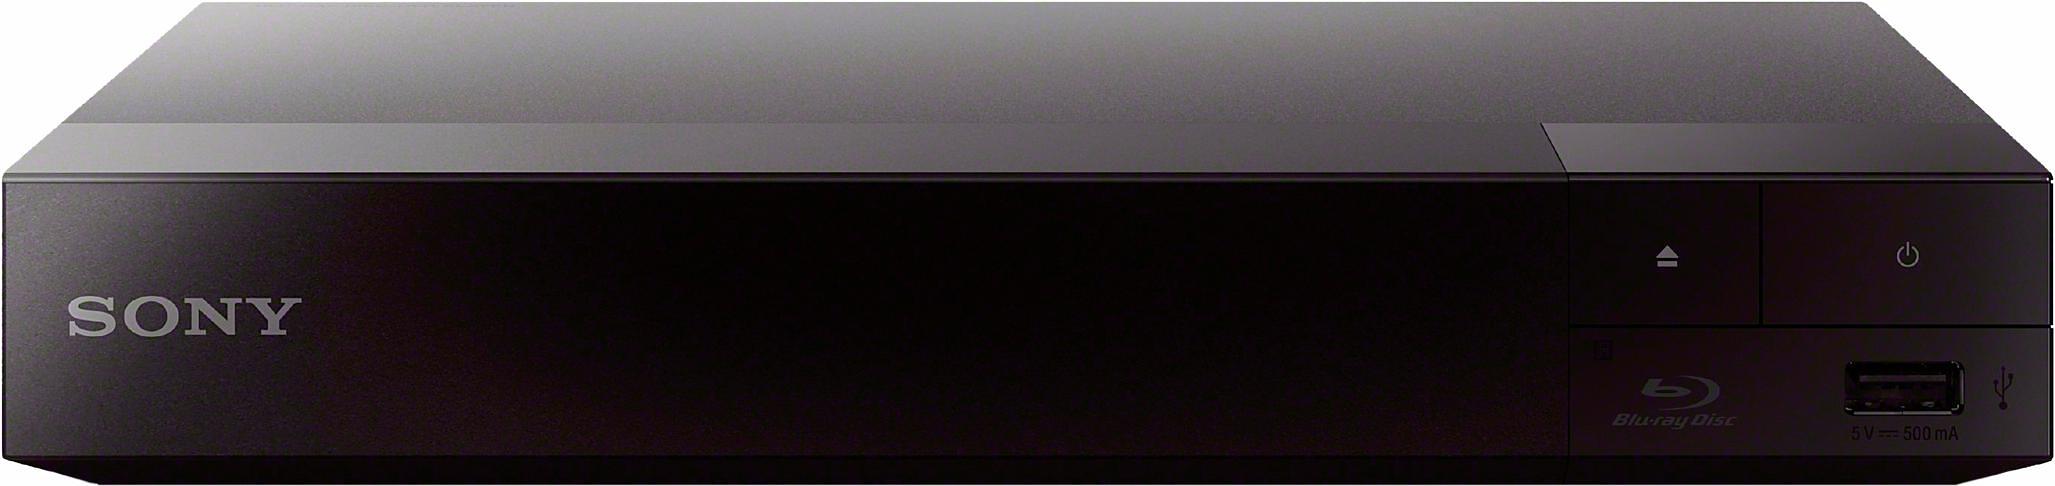 SONY BDP-S3700B blu-ray-speler, Hi-Res - verschillende betaalmethodes